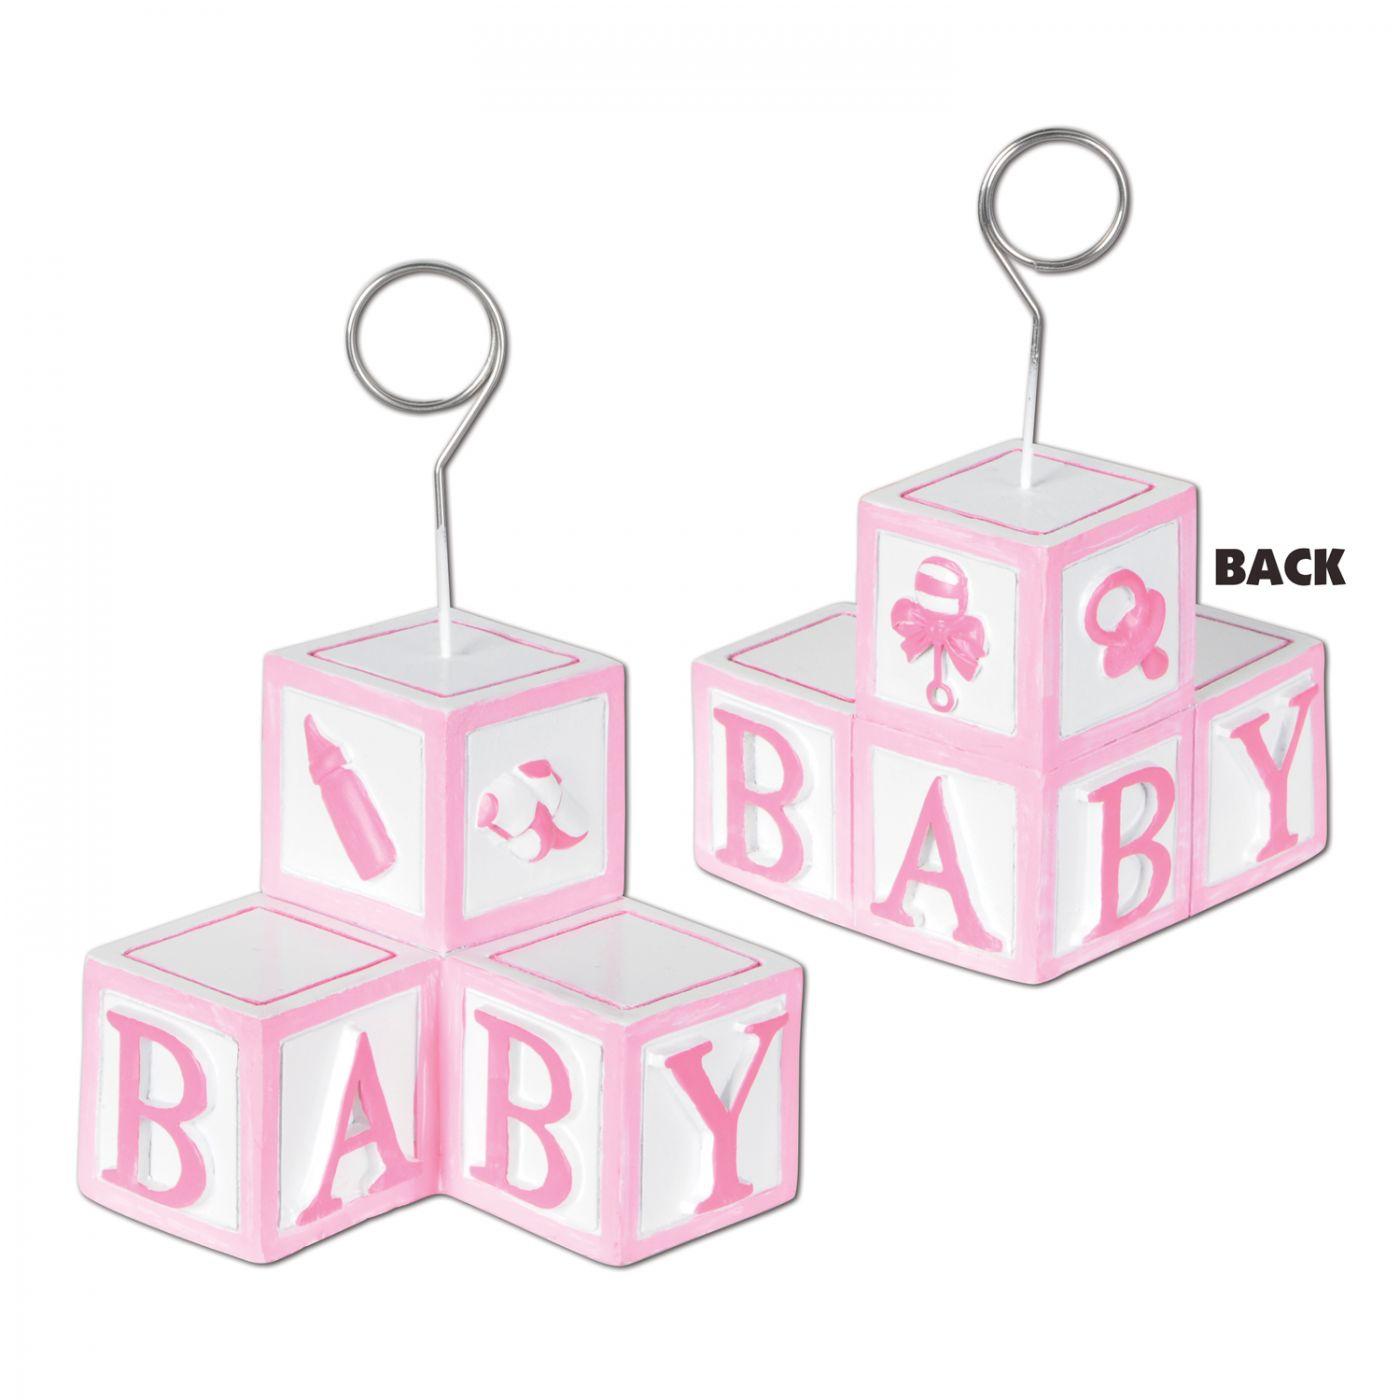 Image of Baby Blocks Photo/Balloon Holder (6)